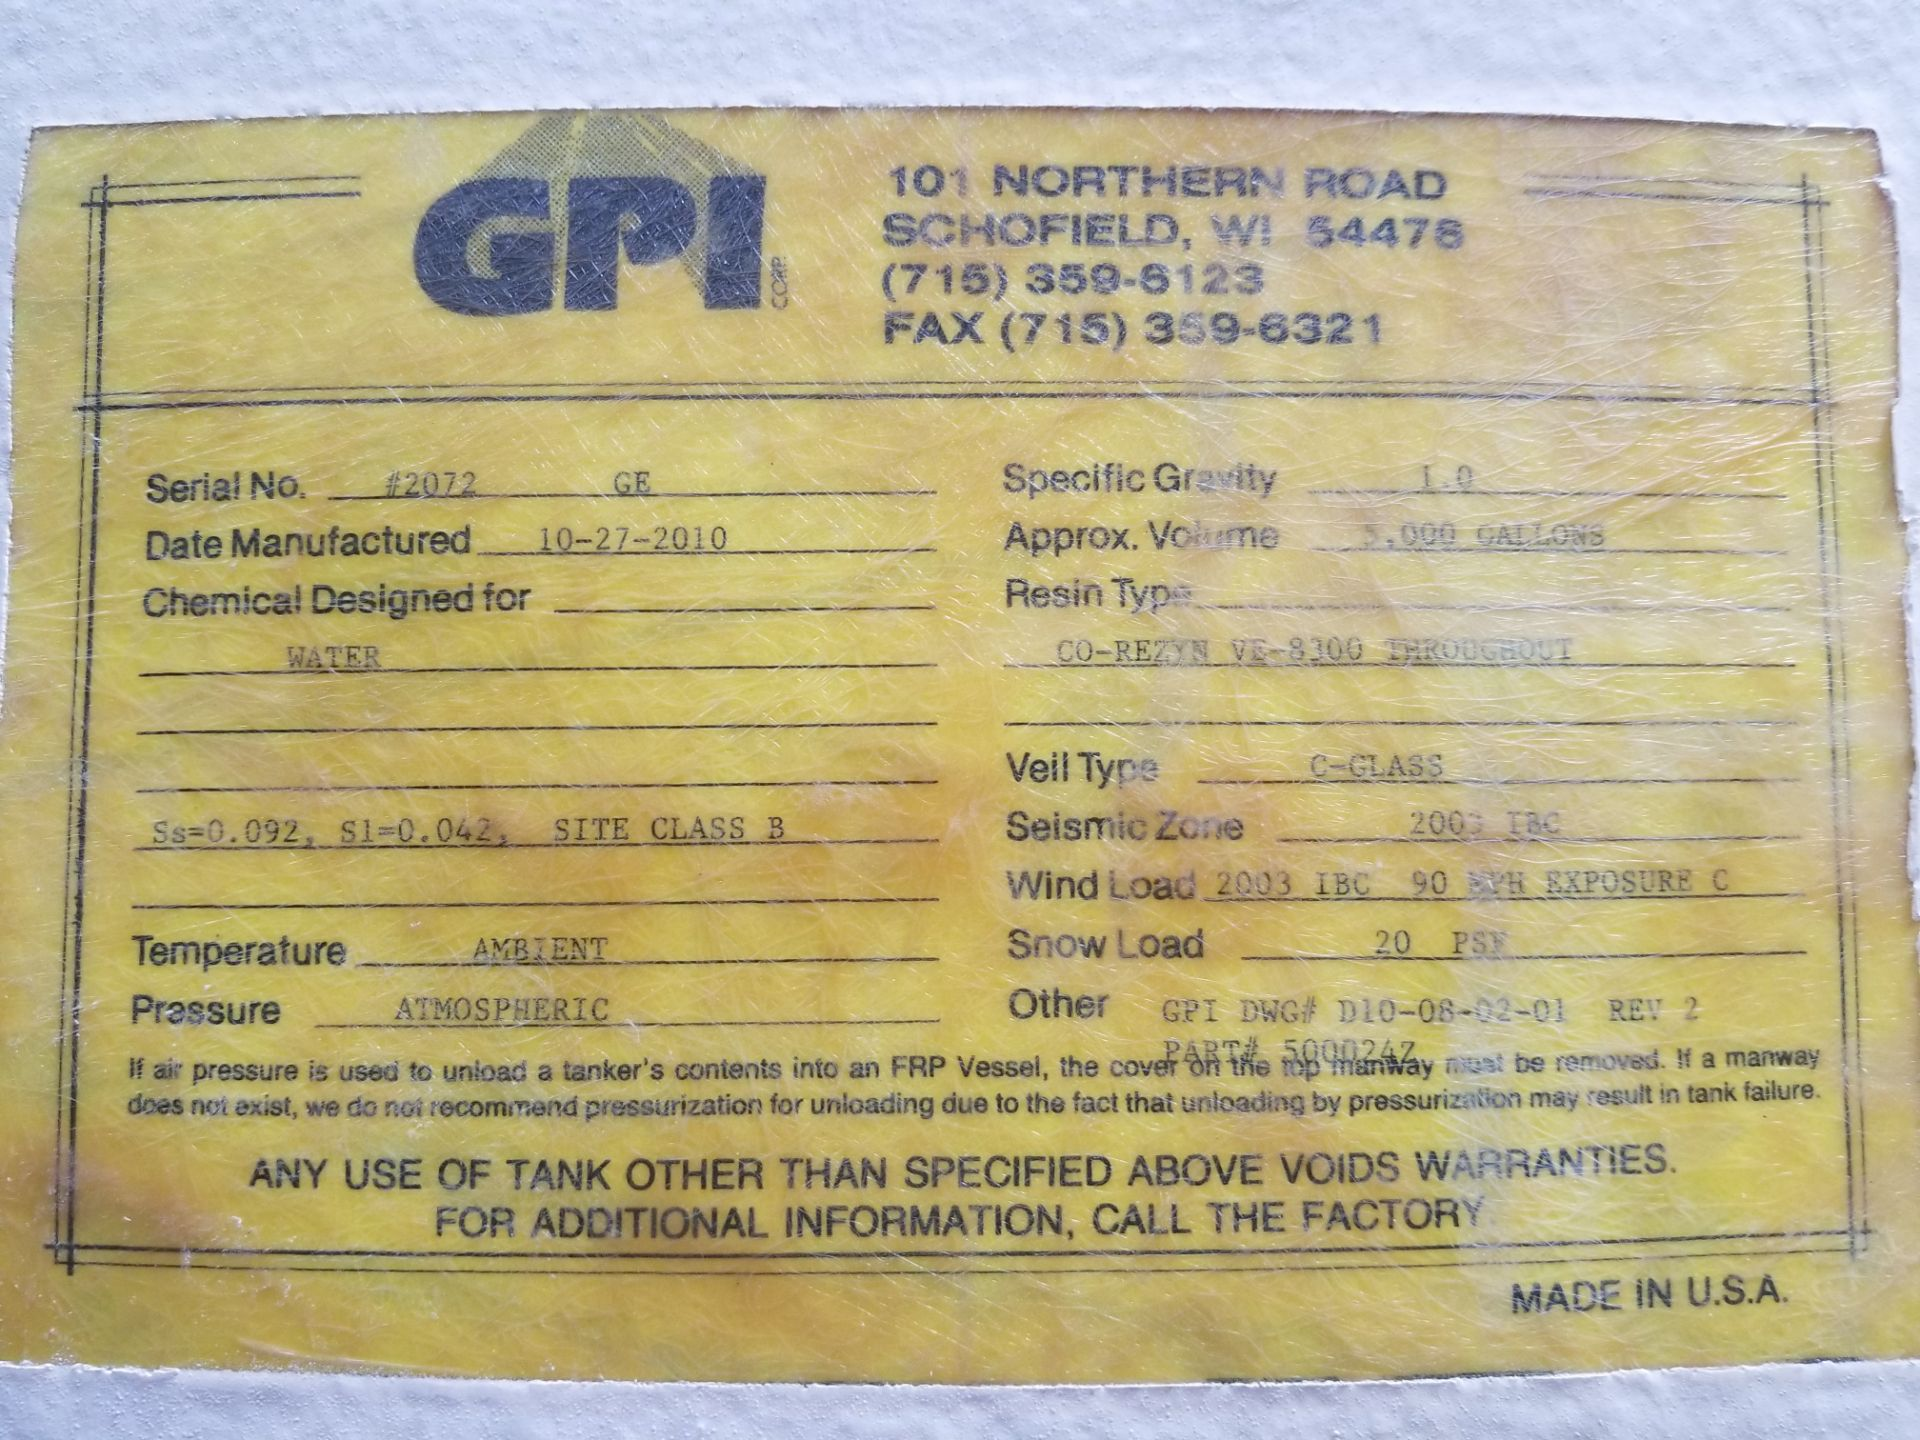 2010 GPI Corp 5000 Gallon Fiberglass Tank - Image 5 of 5